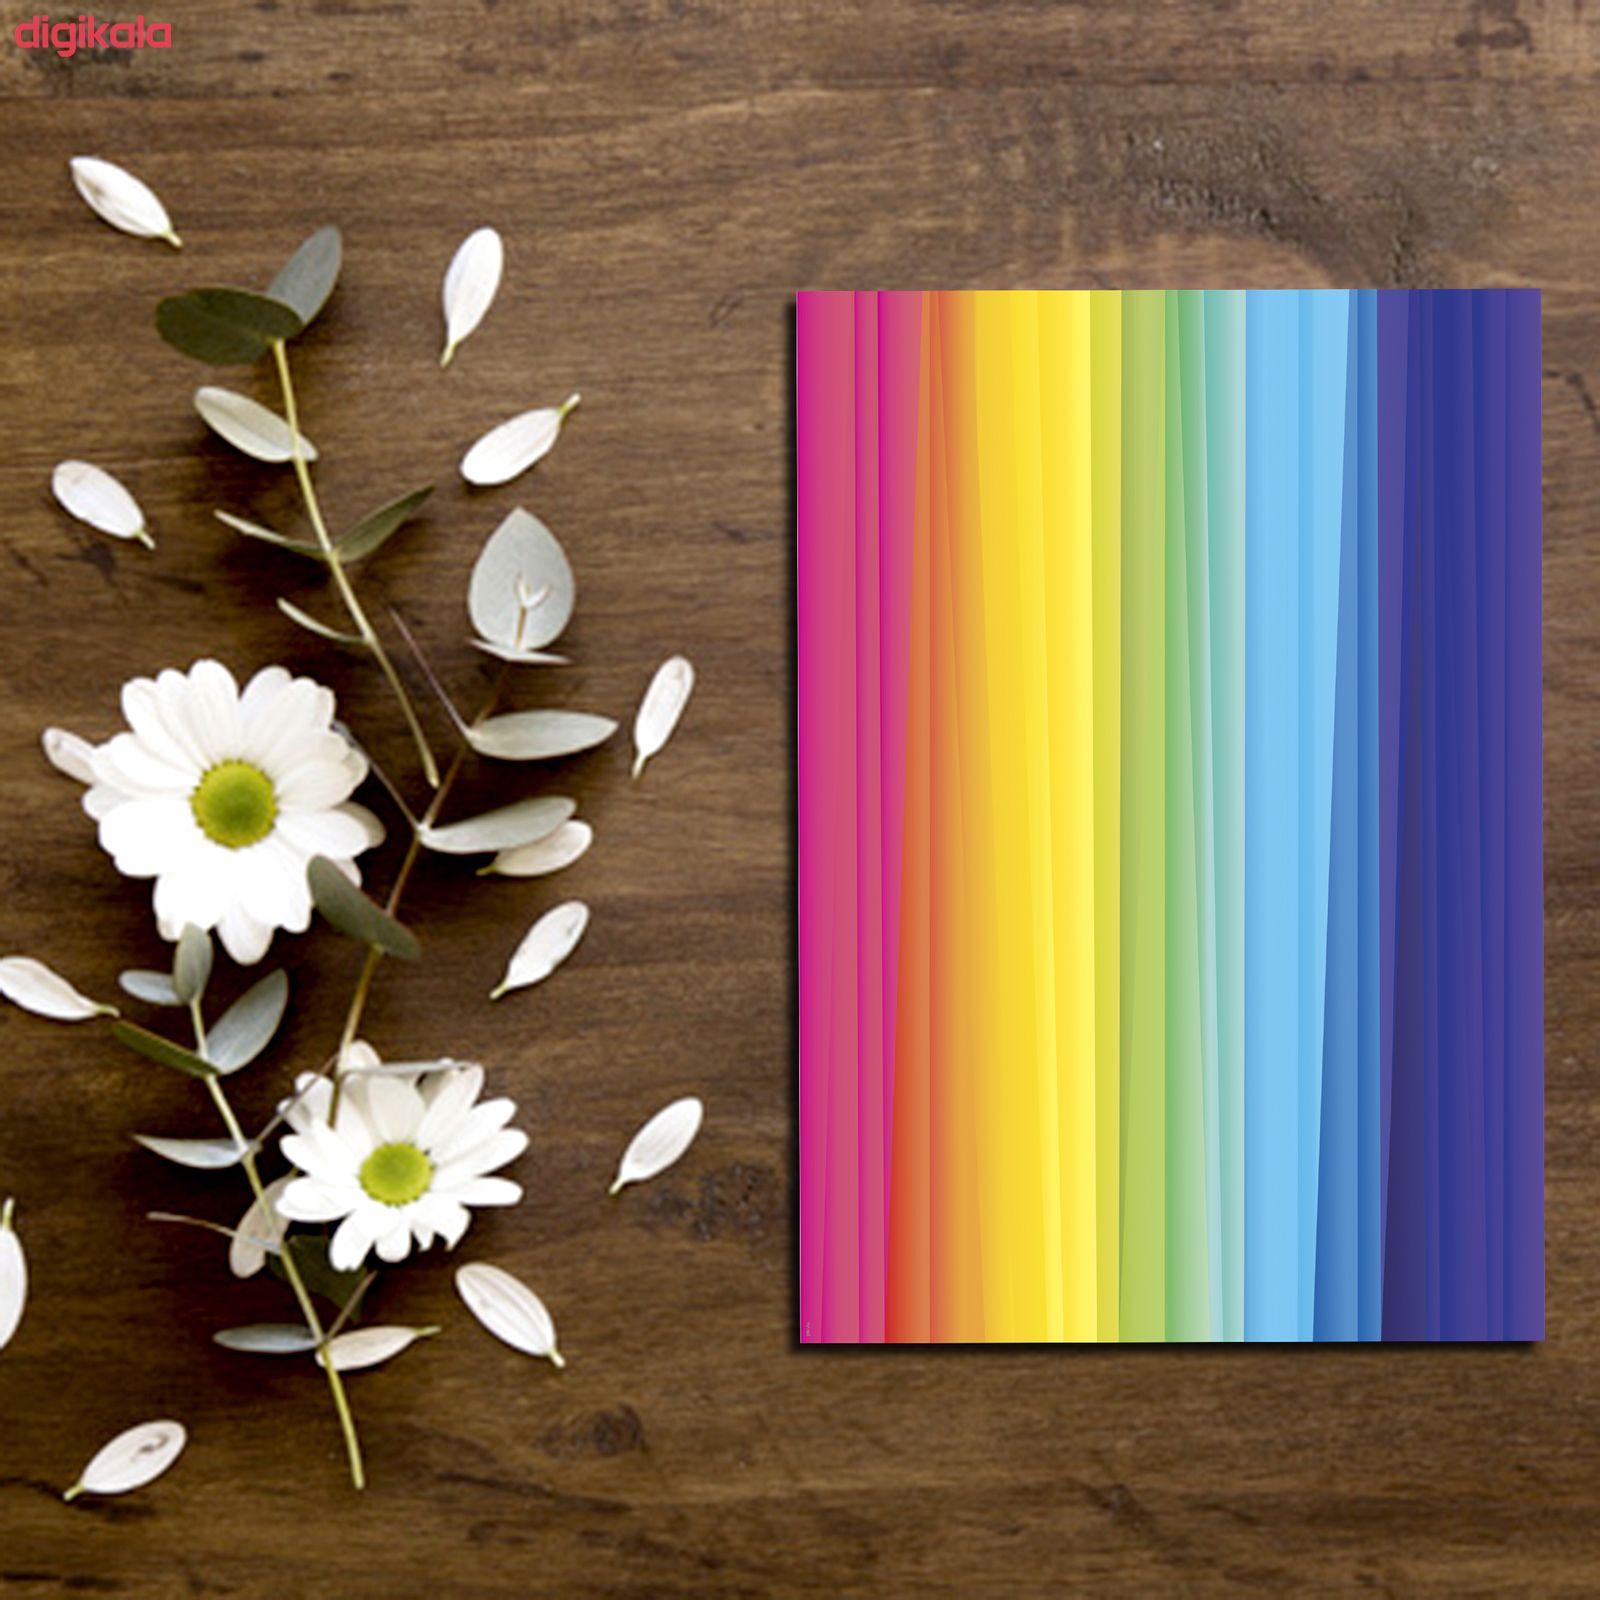 کاغذ رنگی A4 مستر راد مدل رنگارنگ بسته 10 عددی main 1 9